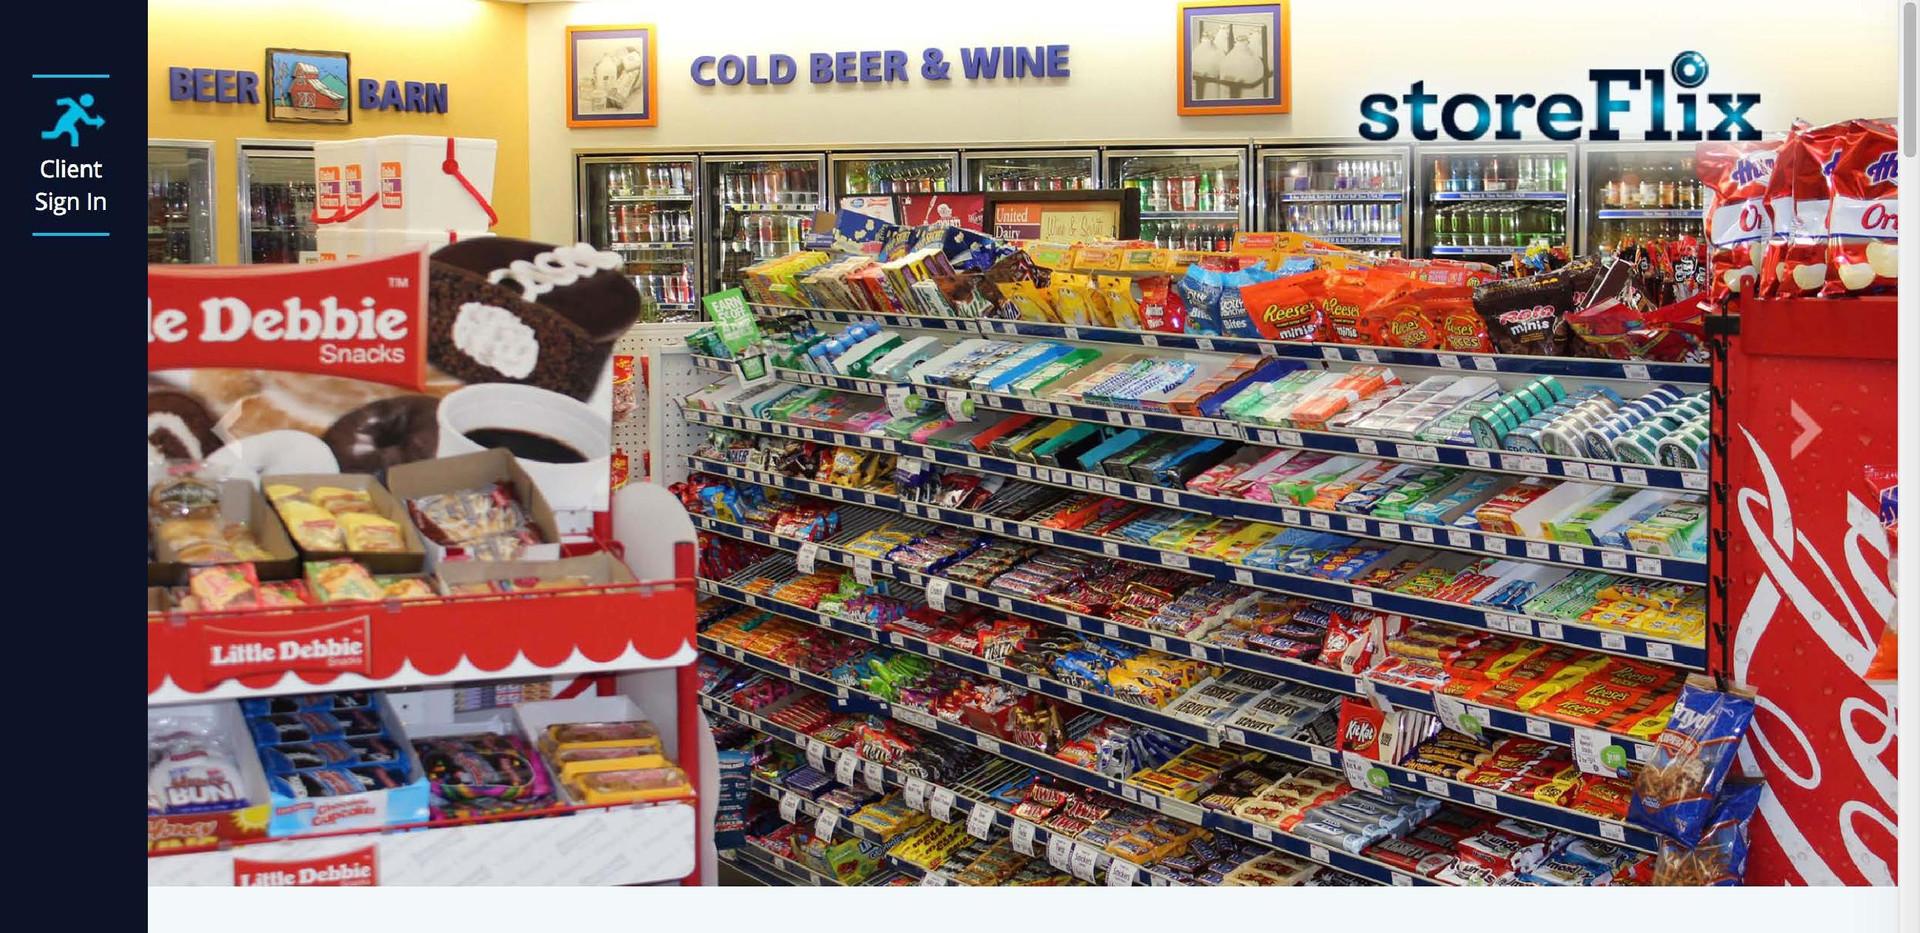 Storeflix.com-page-005.jpg